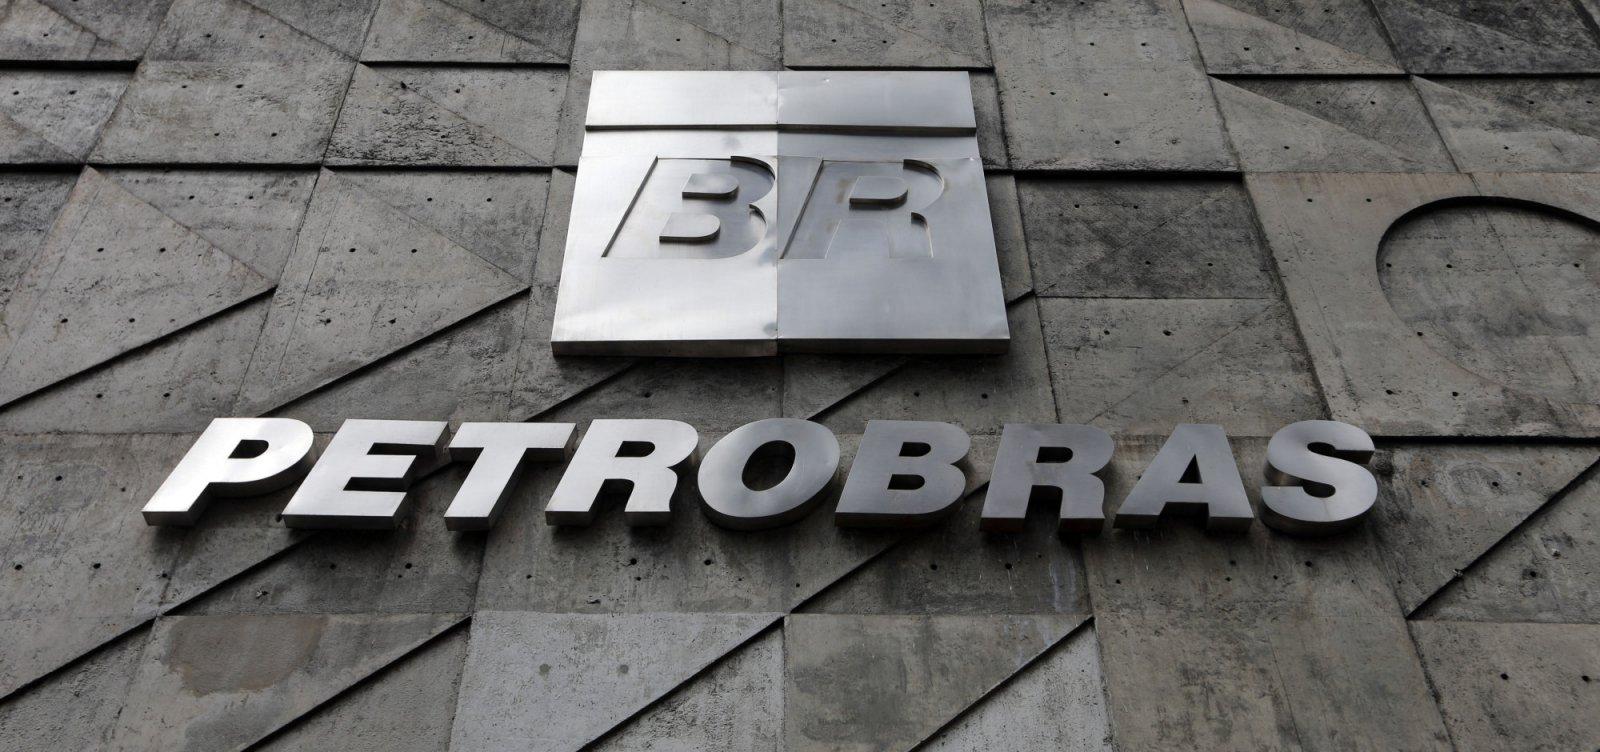 [Petrobras anuncia venda de oito refinarias, incluindo a Landulpho Alves]